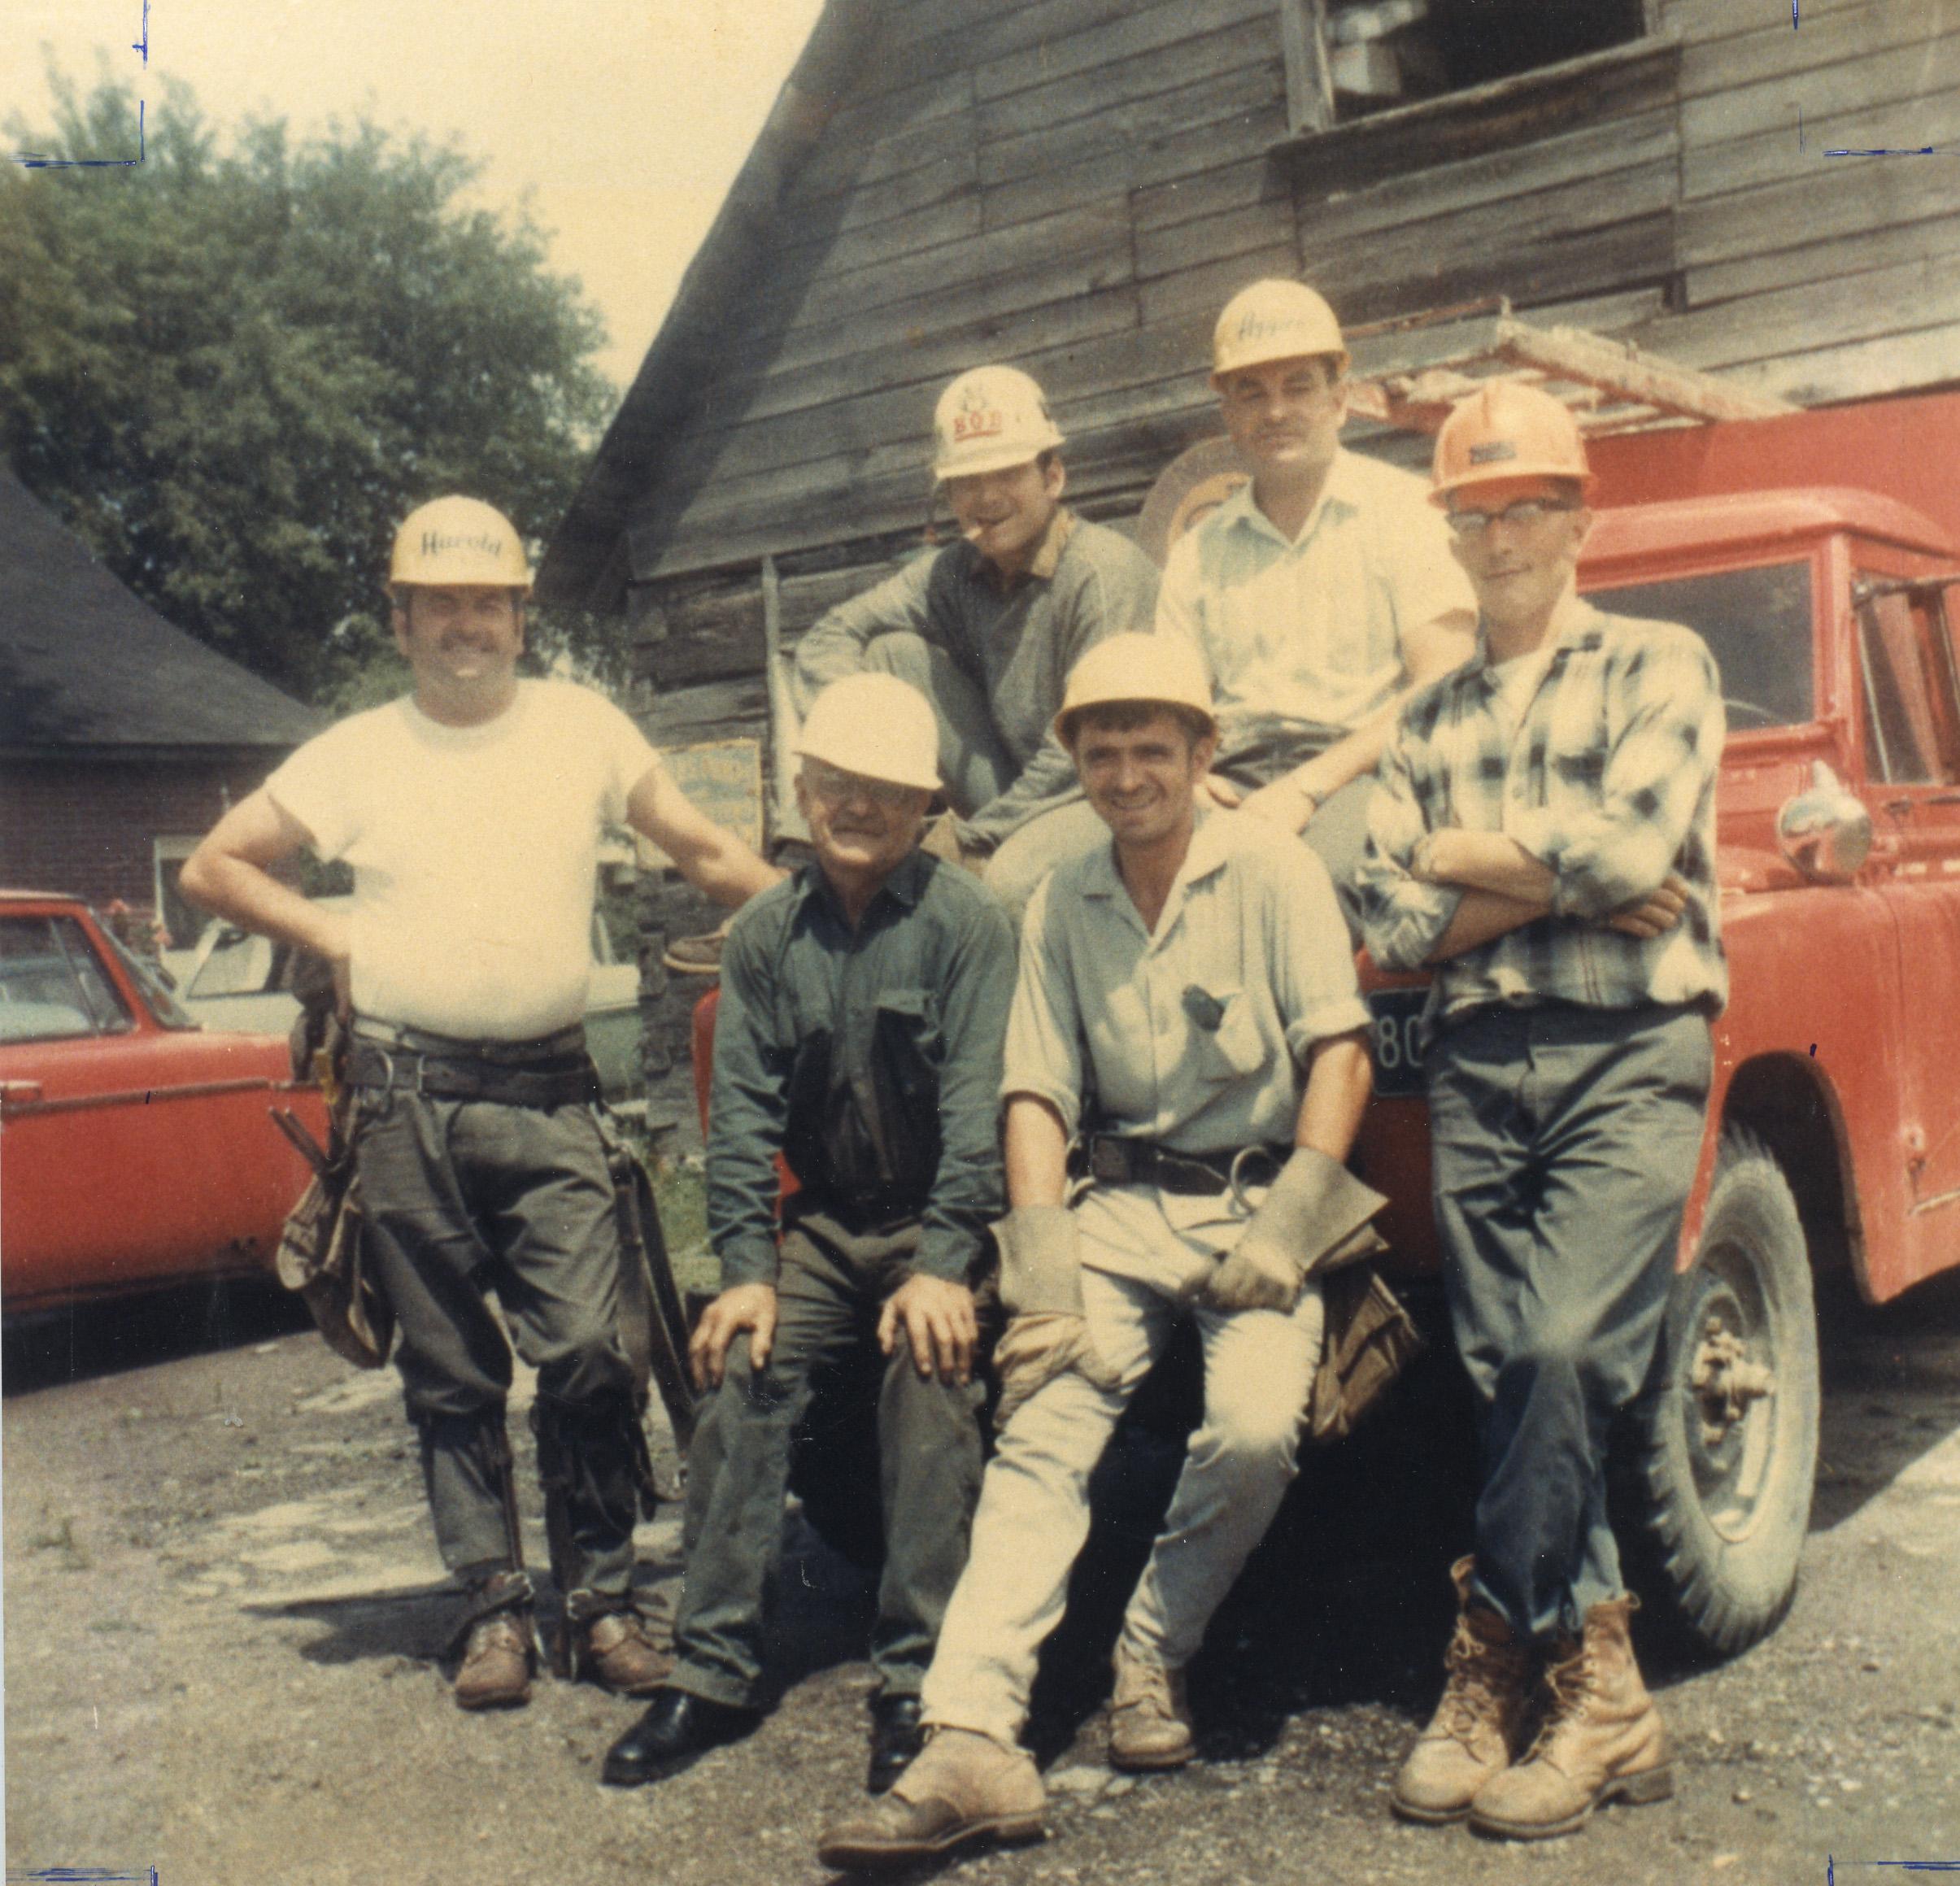 Équipe de fin de semaine de Richmond Hydro, 1969